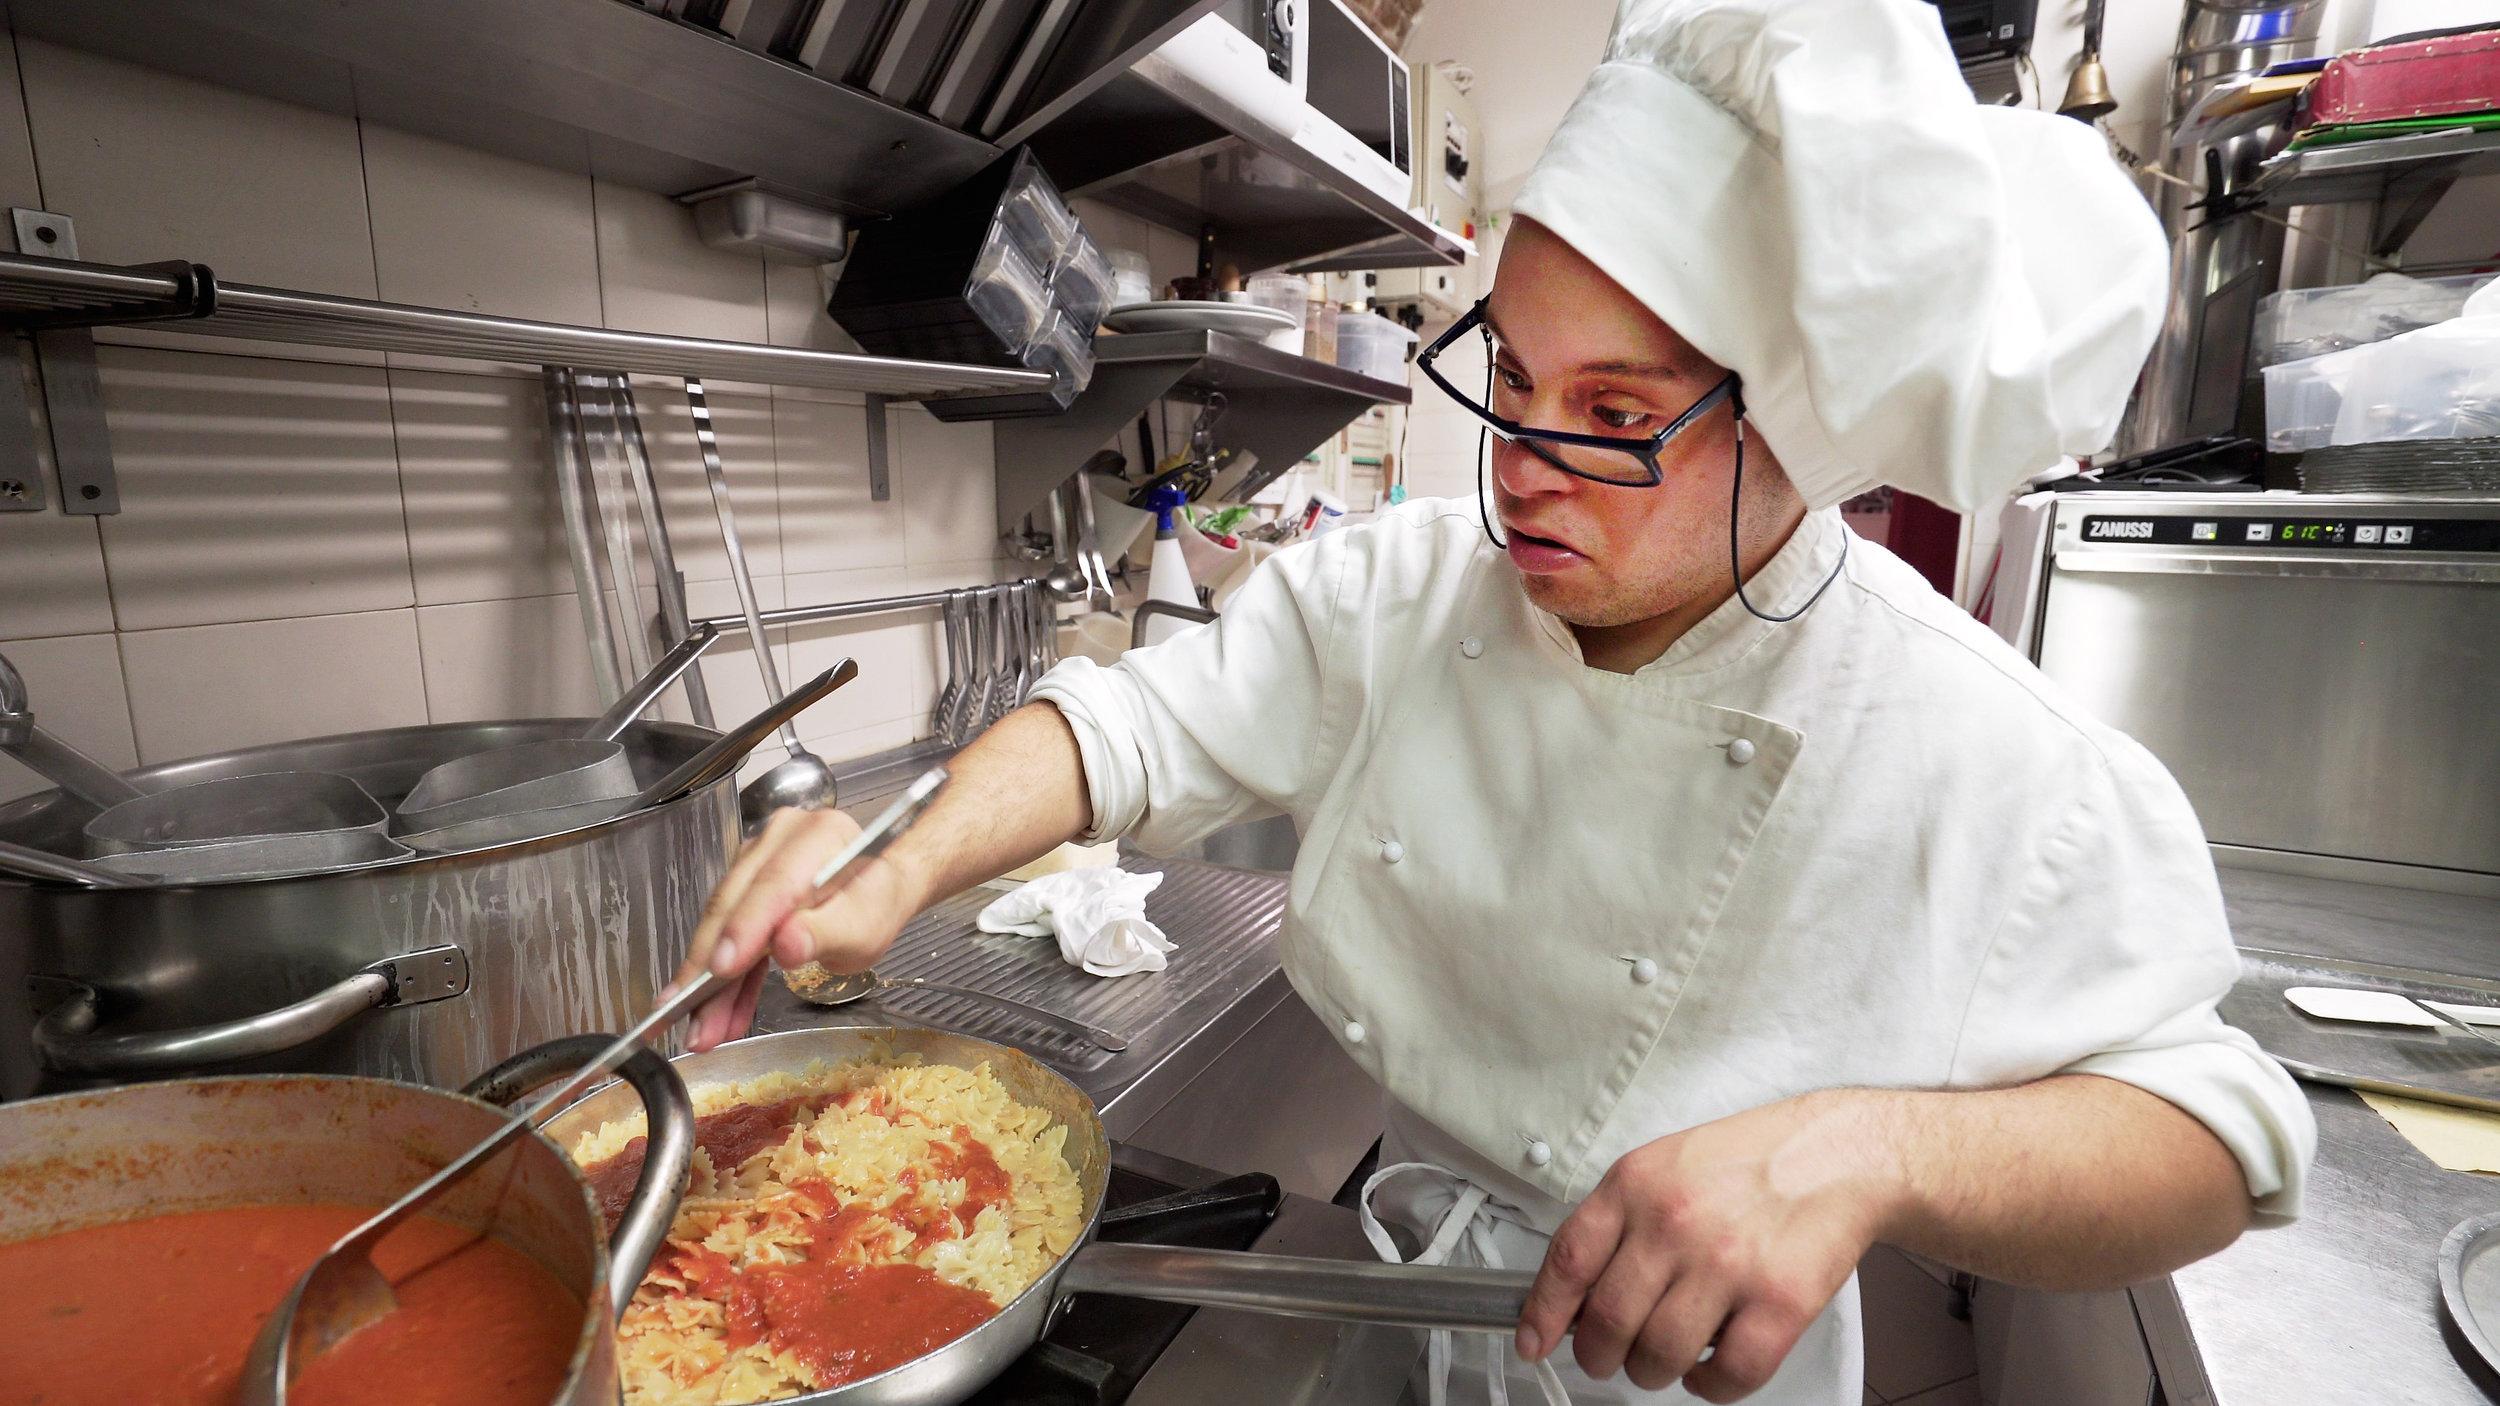 Trainee chef Mirko Piras at Tacabanda restaurant Asti Italy